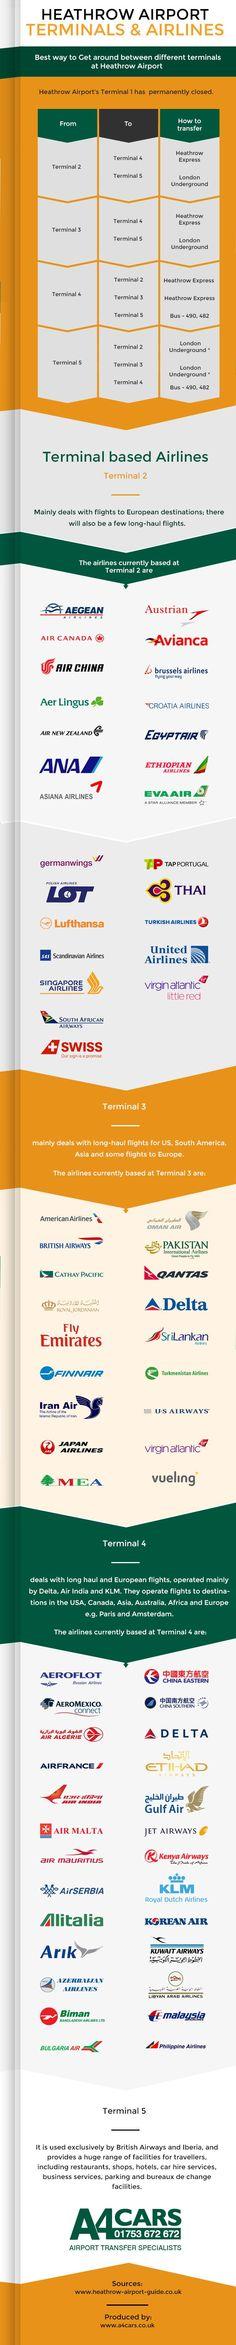 Heathrow airport transfers infographic part 2